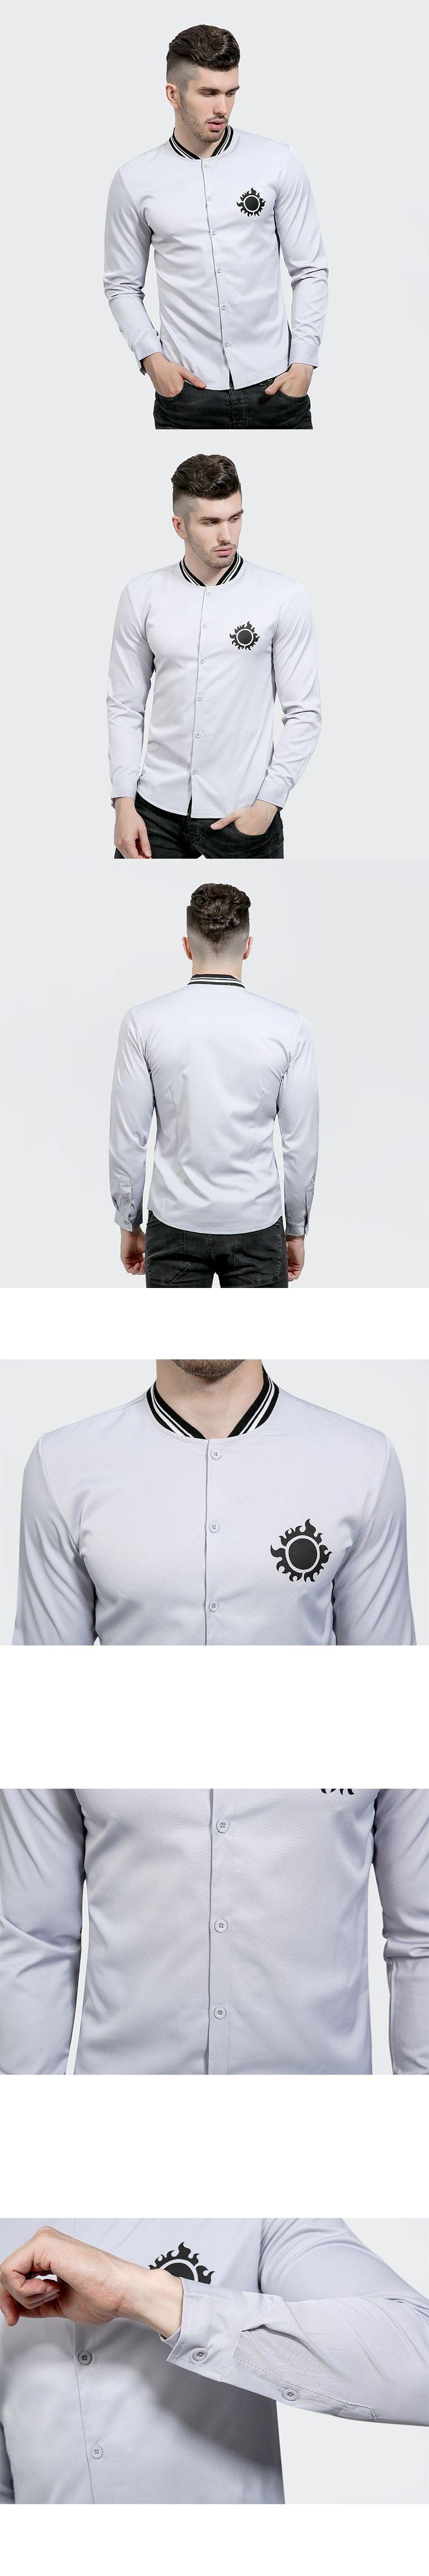 Luxury Brand Men Shirt Chemise Homme 2017 Fashion Design Long Sleeve Mens Dress Shirts Casual Stylish Slim Fit Camisas Hombre